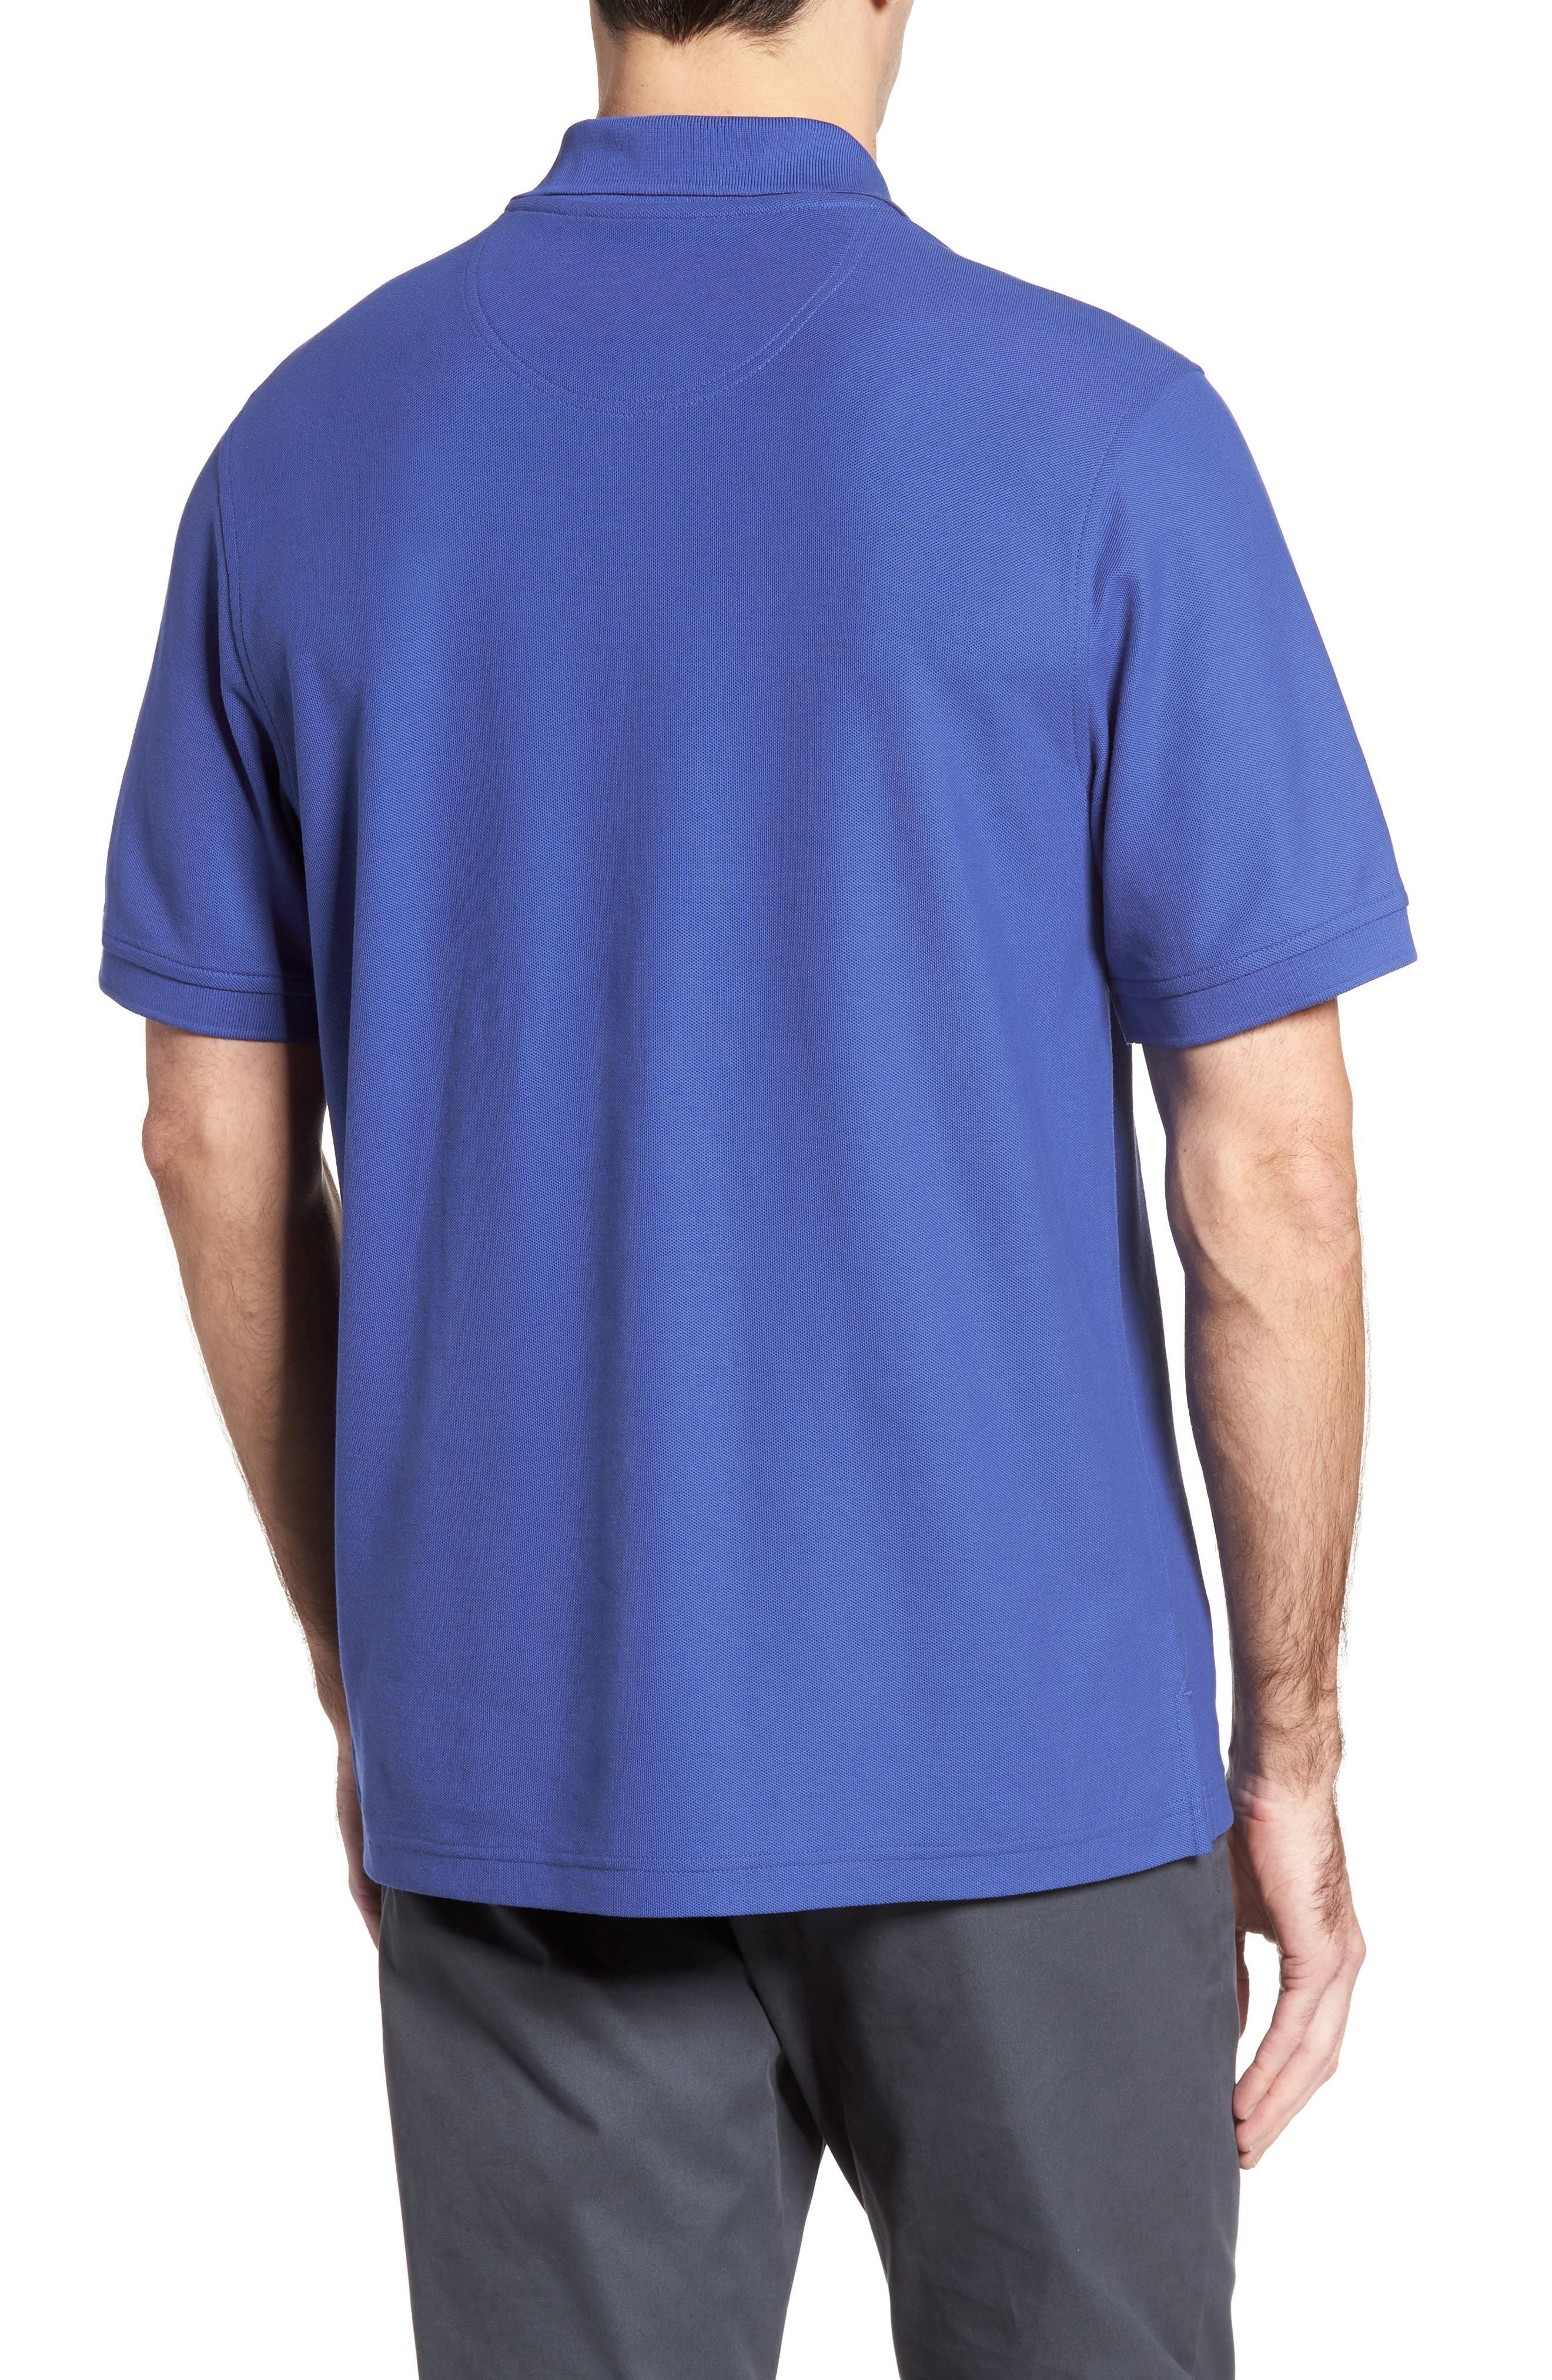 Alternate Image 2  - Nordstrom Men's Shop 'Classic' Regular Fit Piqué Polo